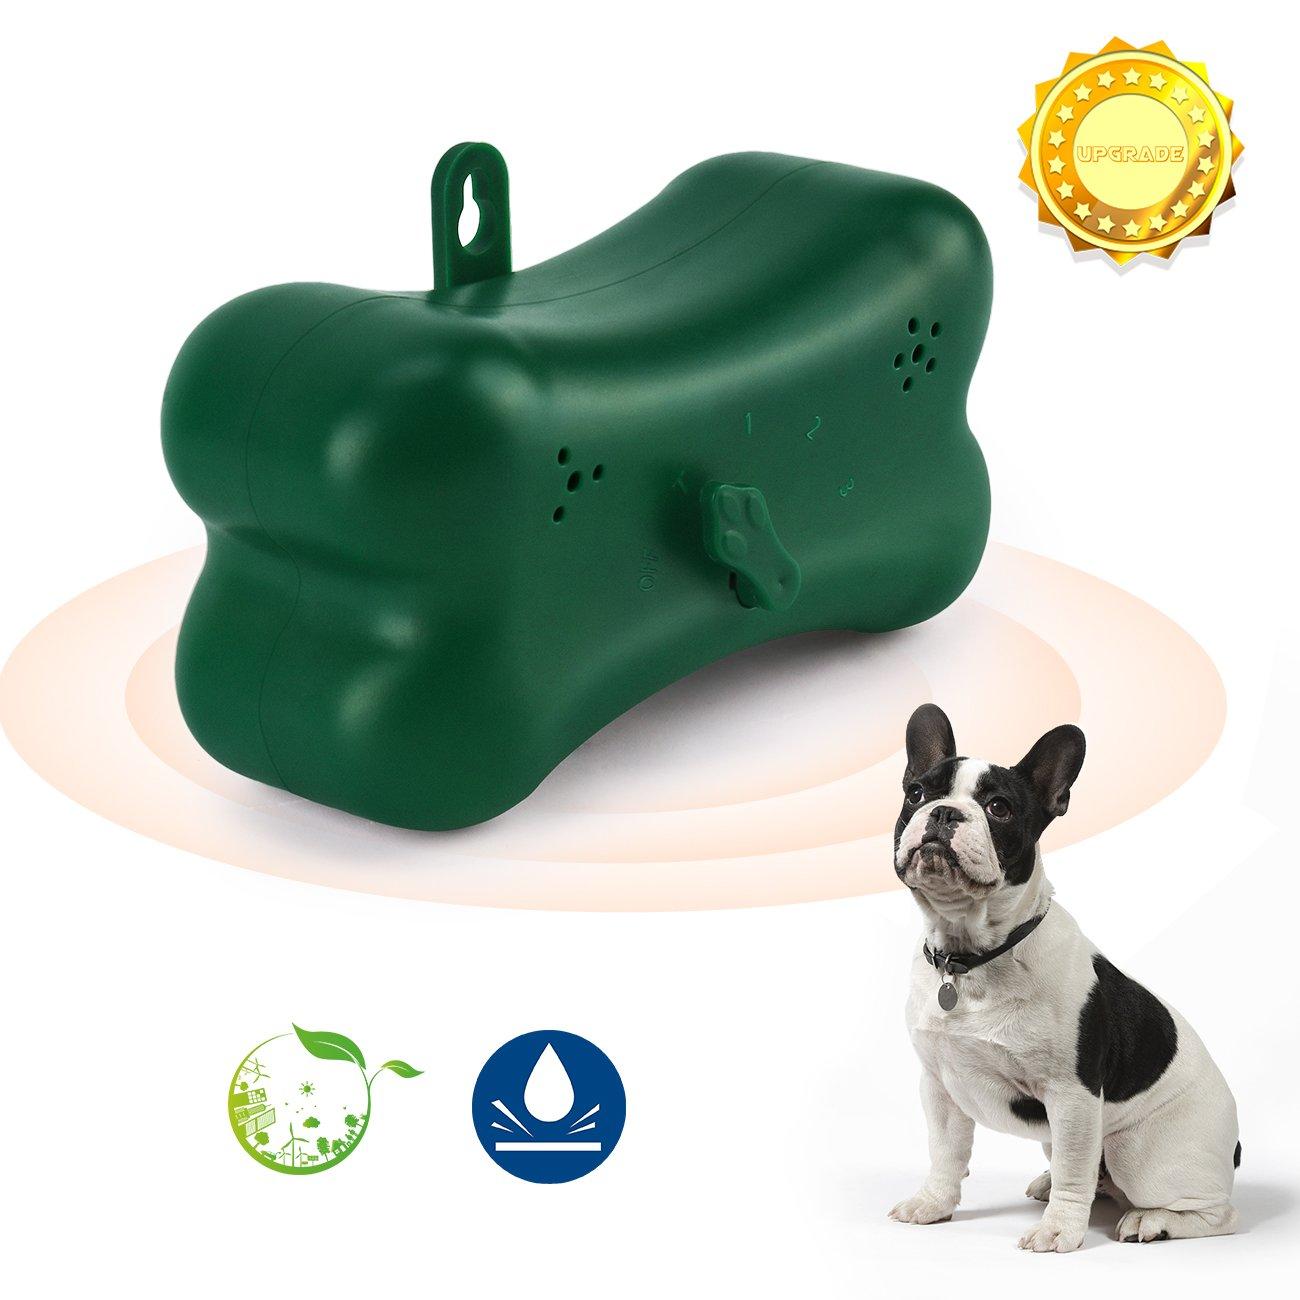 Bark Control Device, Zomma Mini Bark Control Device Indoor/Outdoor Anti Barking Ultrasonic Dog Bark Control Sonic Bark Deterrents Silencer Stop Barking, Dog Bark Control (UPGRADED)